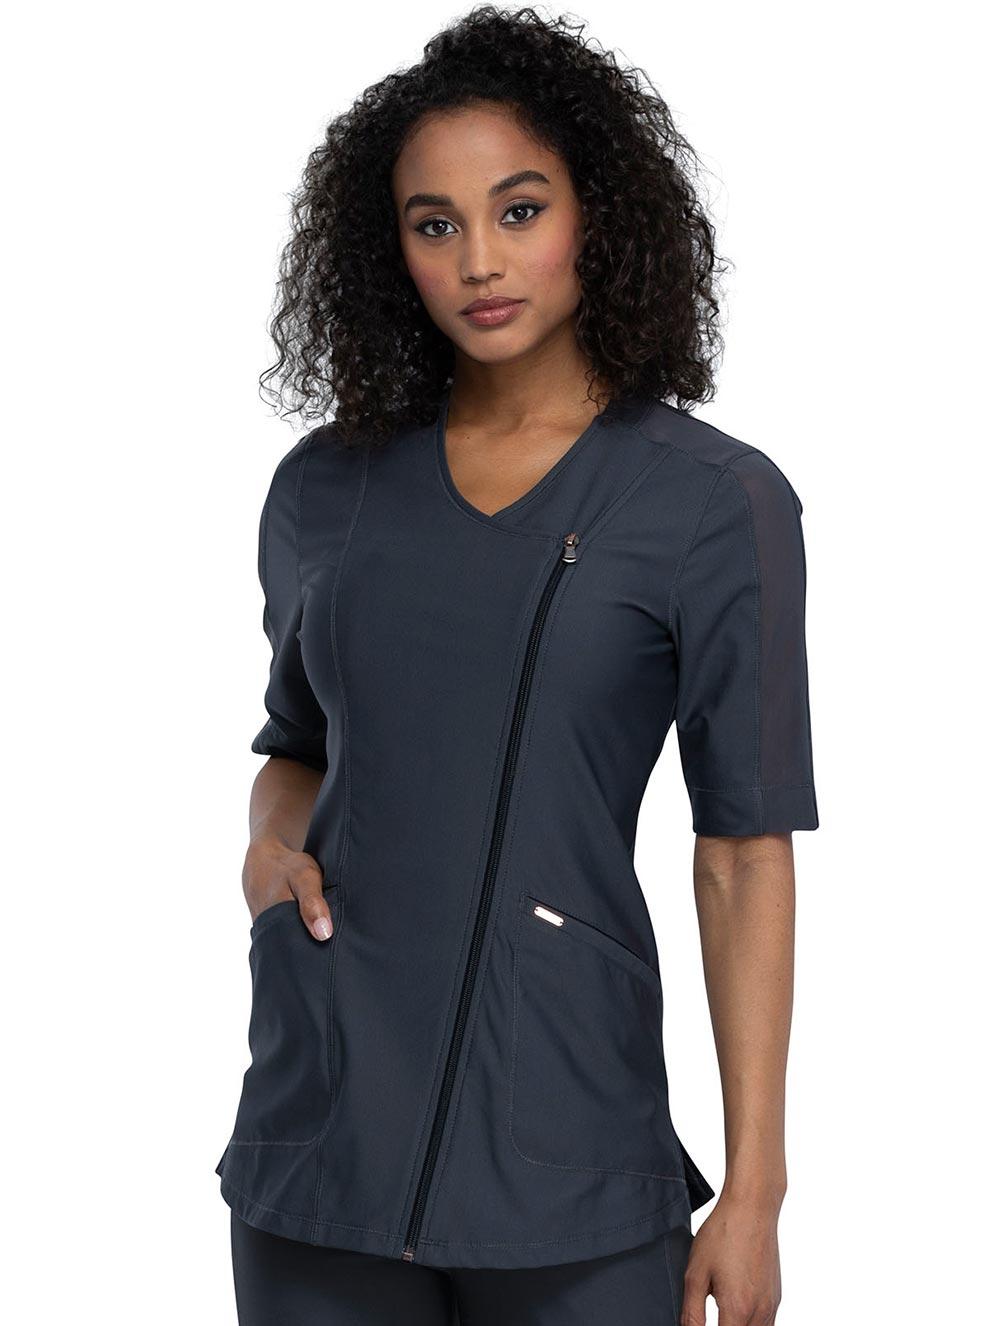 Asymmetrical Zip Front Tunic